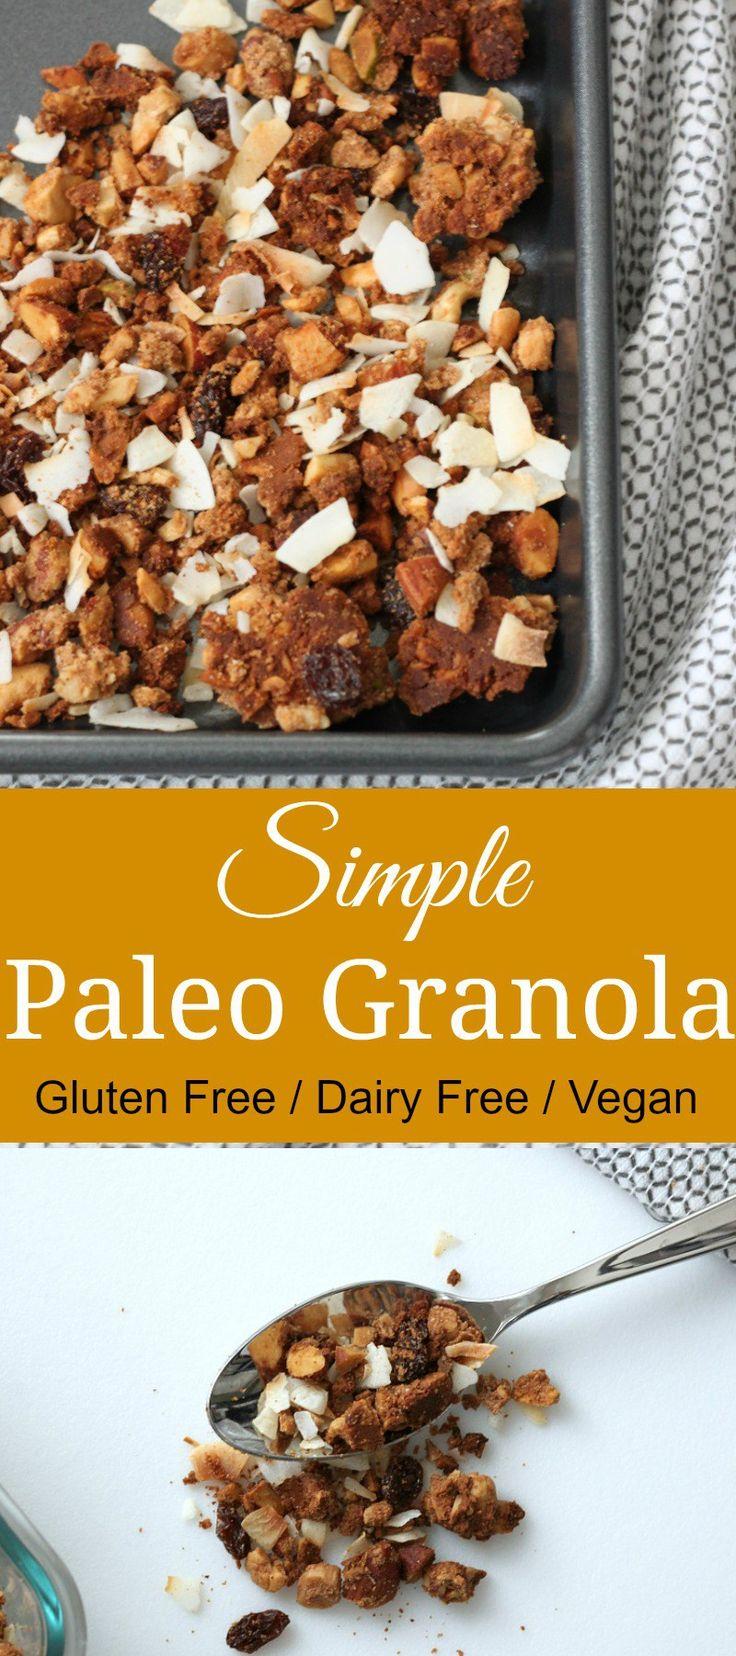 Easy to make & delicious paleo granola. #paleorecipes #paleo #healthyliving